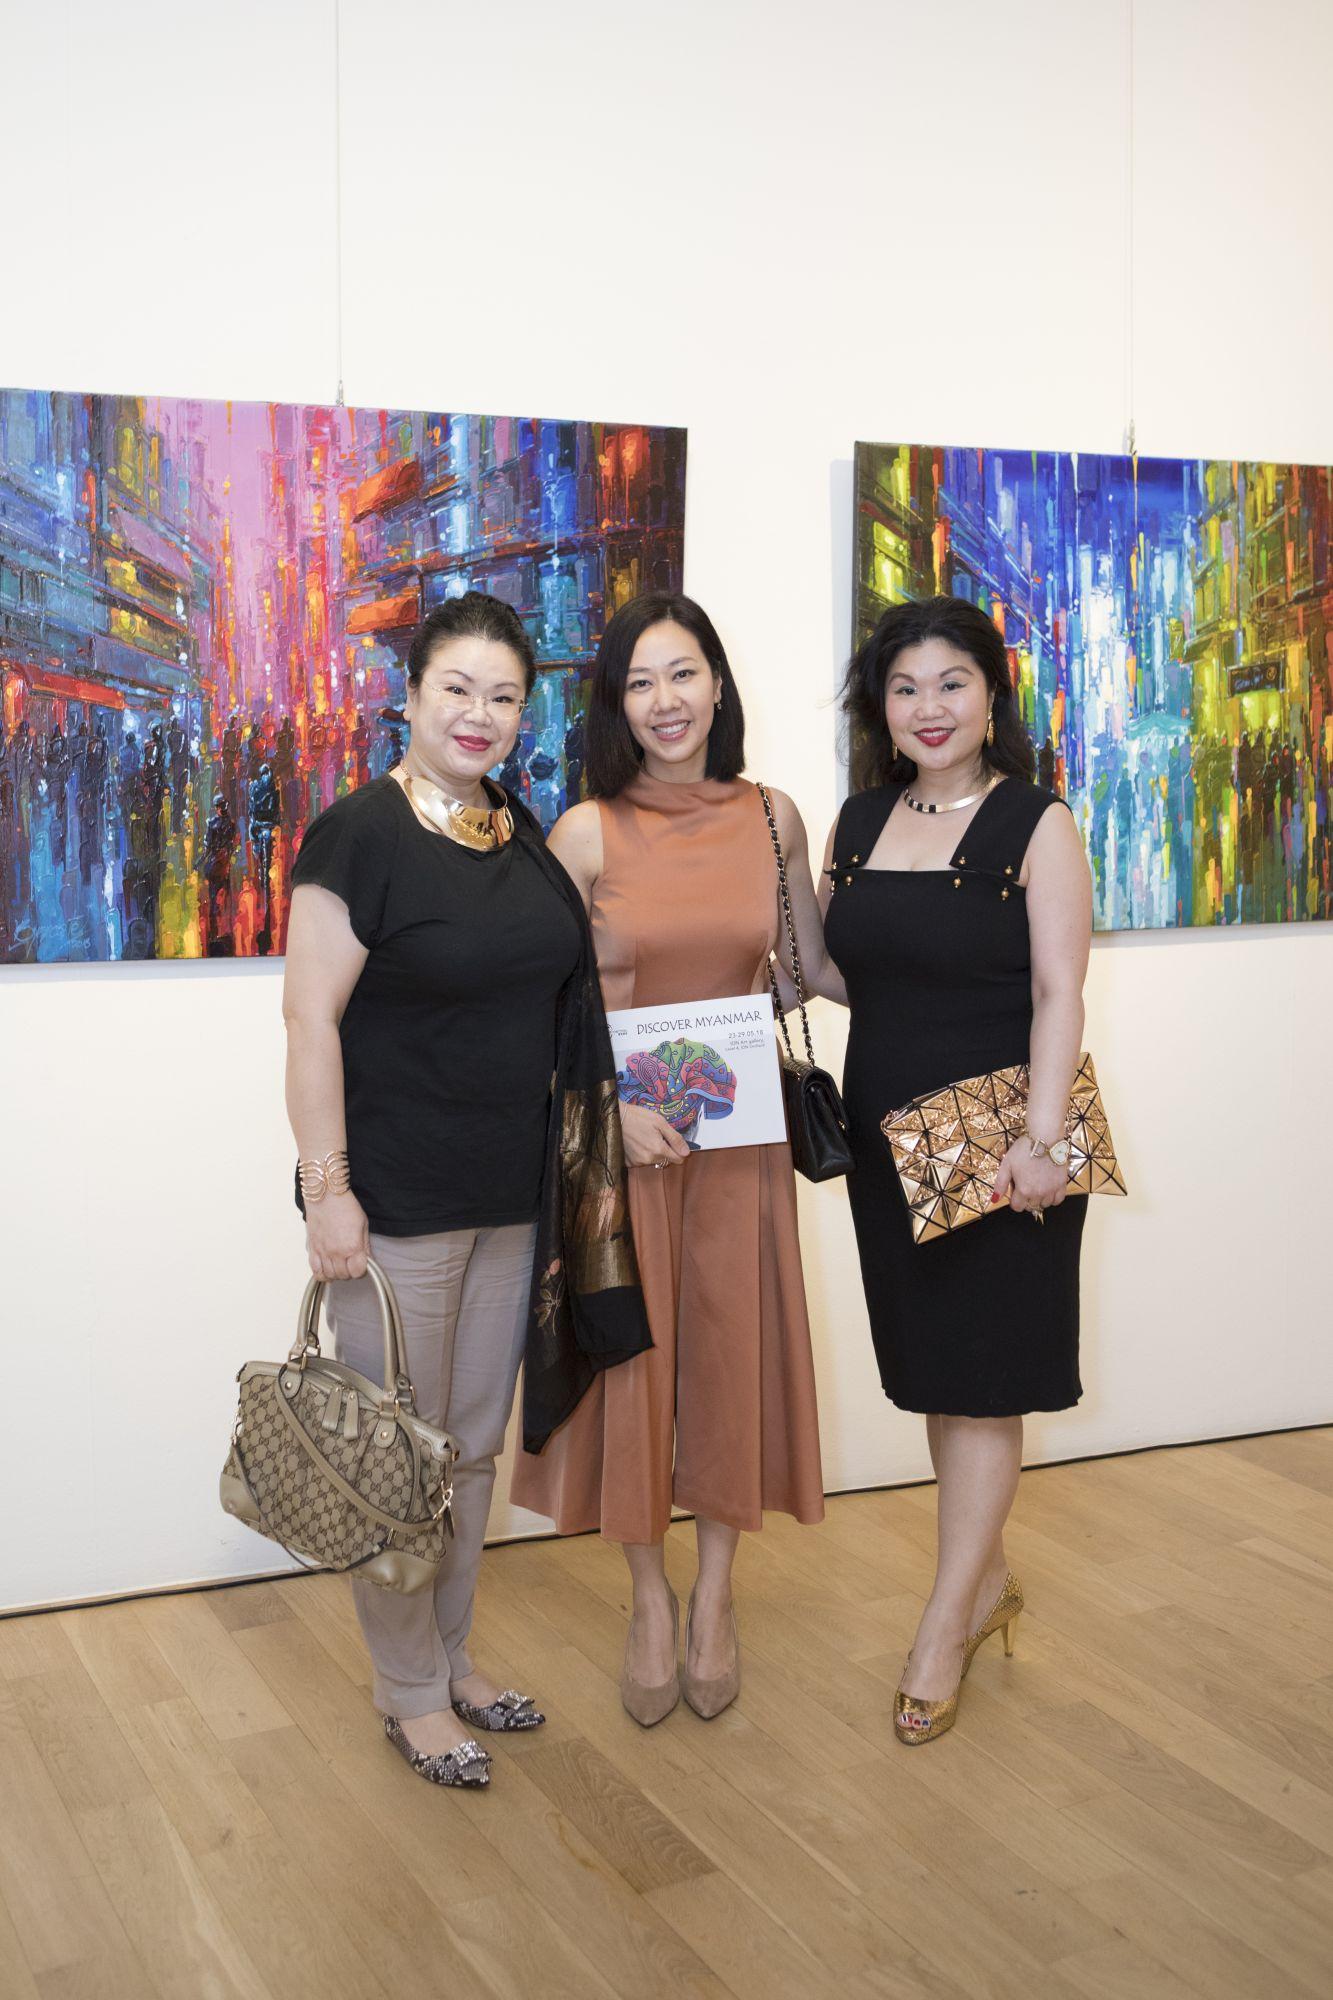 Lam Min Yee, Kissa Castañeda, Lam Tse Yi